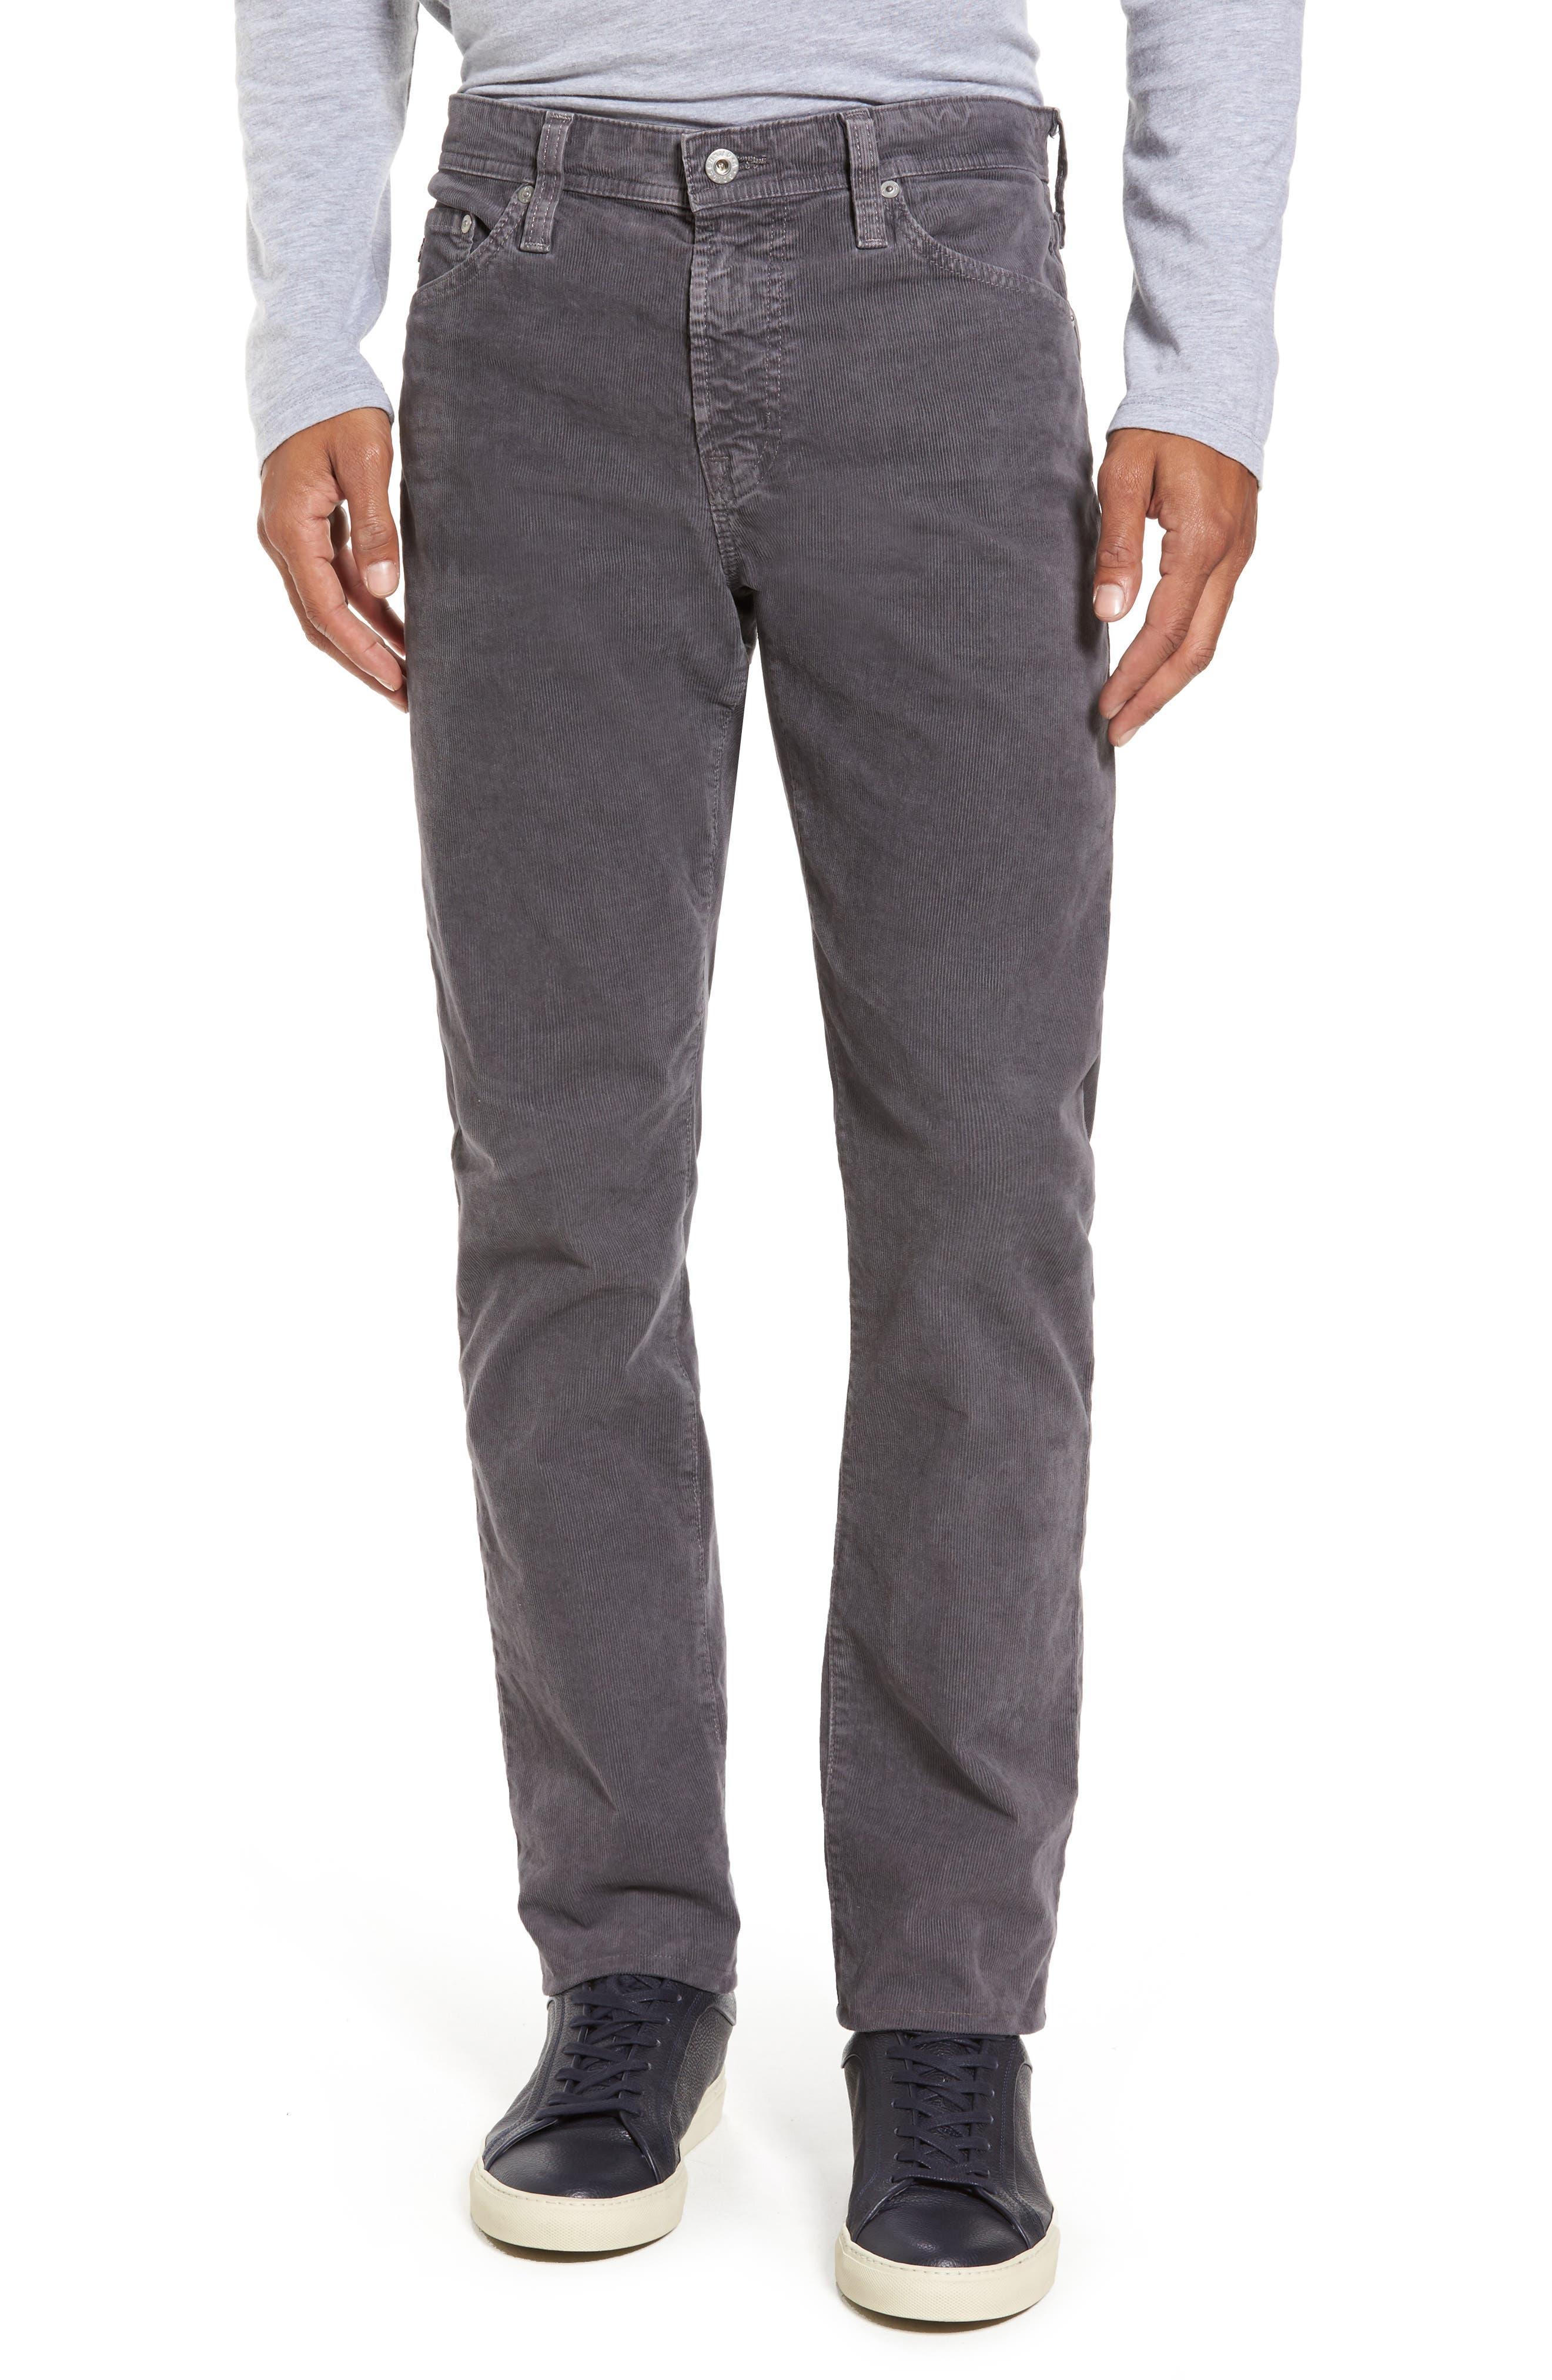 Everett Straight Leg Corduroy Pants,                         Main,                         color, Sulfur Field Stone